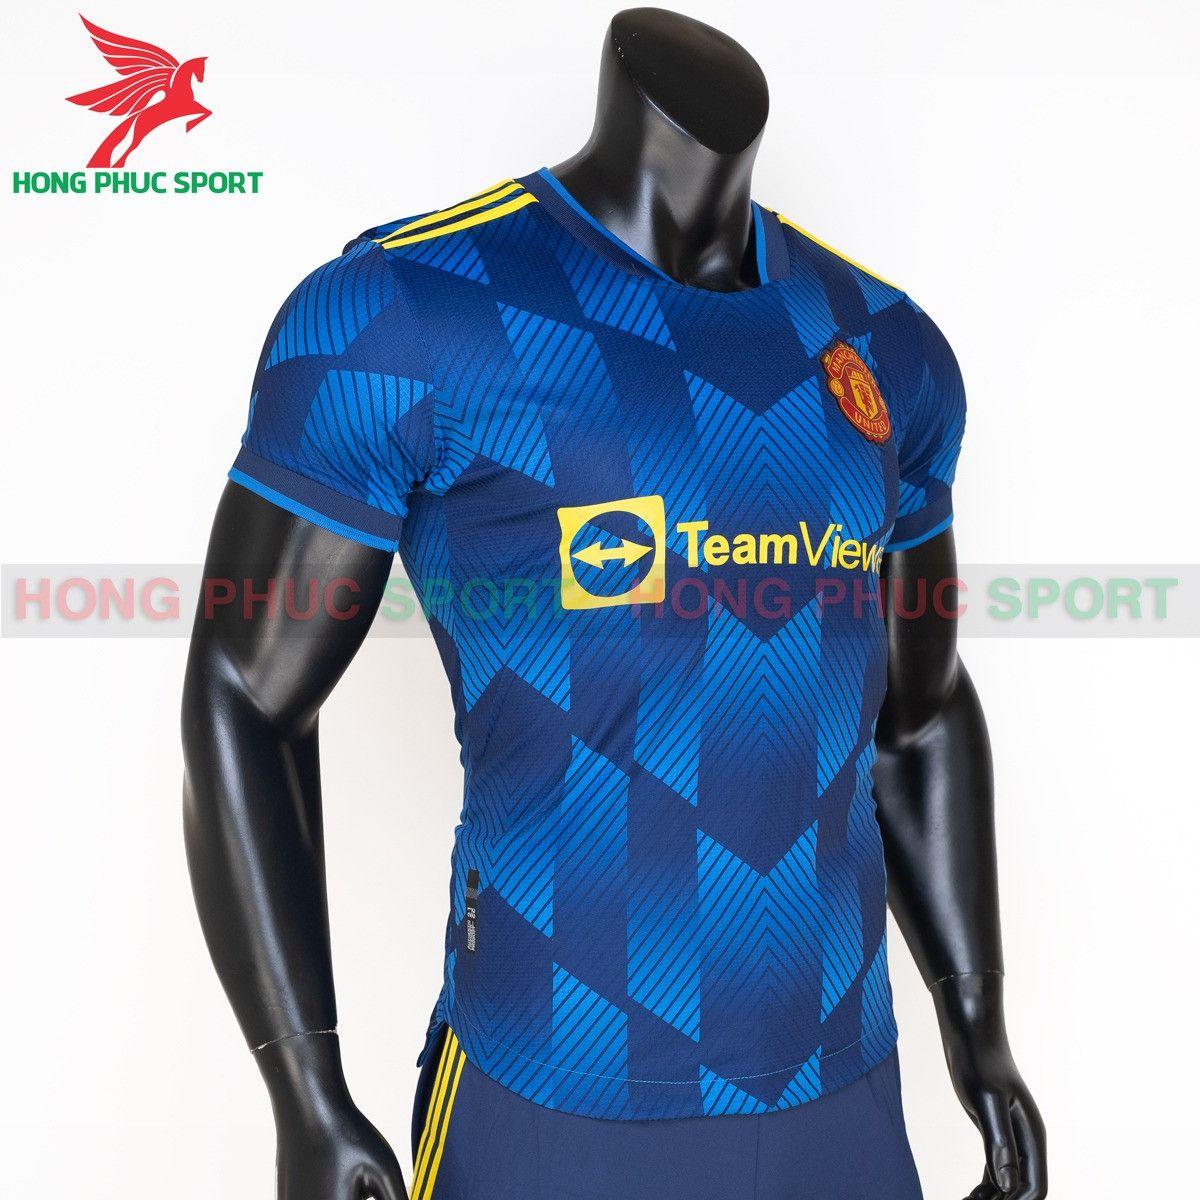 https://cdn.hongphucsport.com/unsafe/s4.shopbay.vn/files/285/ao-dau-manchester-united-2021-2022-mau-thu-3-thailand-2-6149b0dbea3a7.jpg